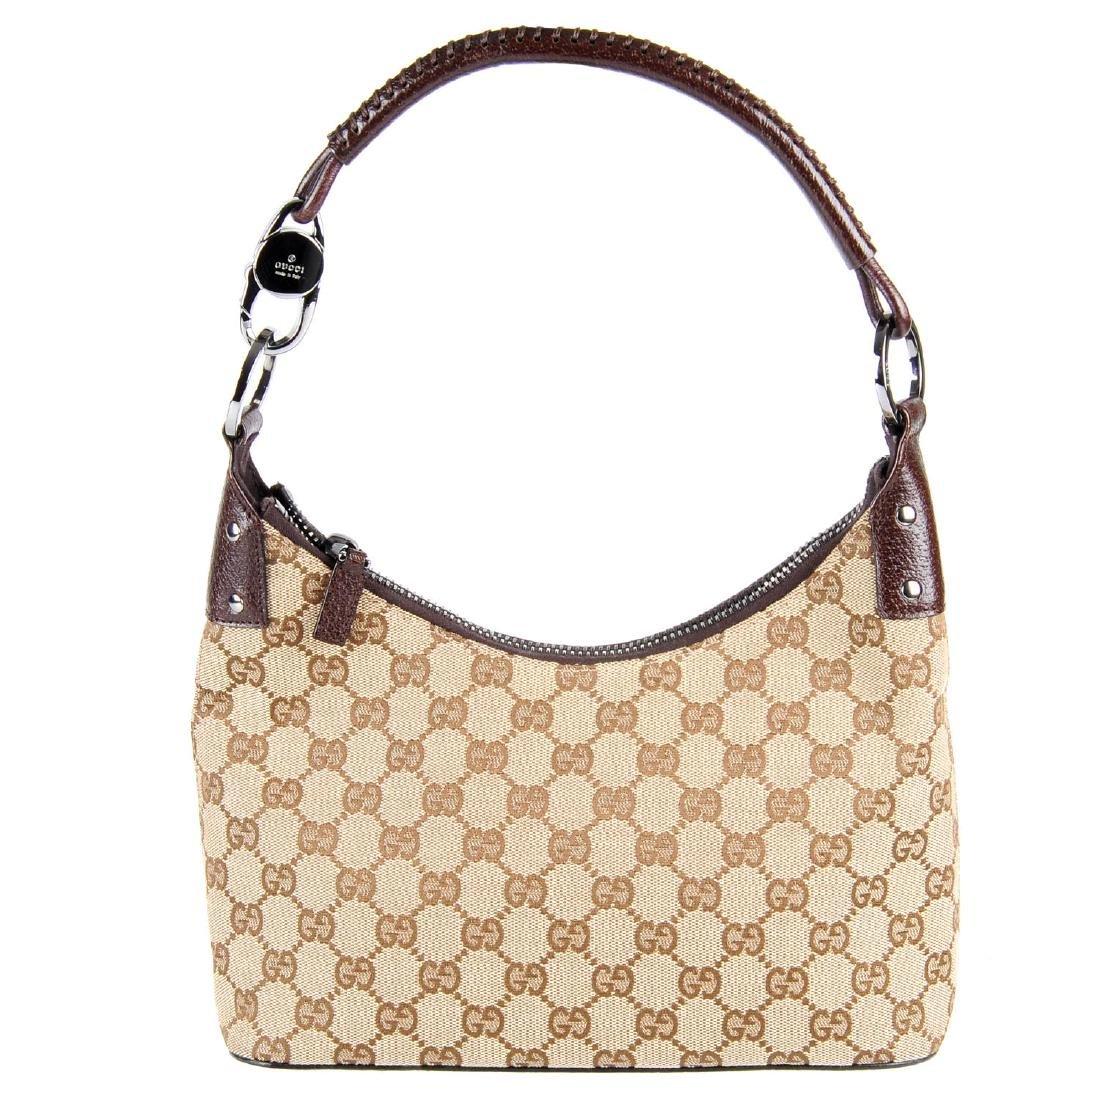 GUCCI - a Monogram canvas handbag. Designed with